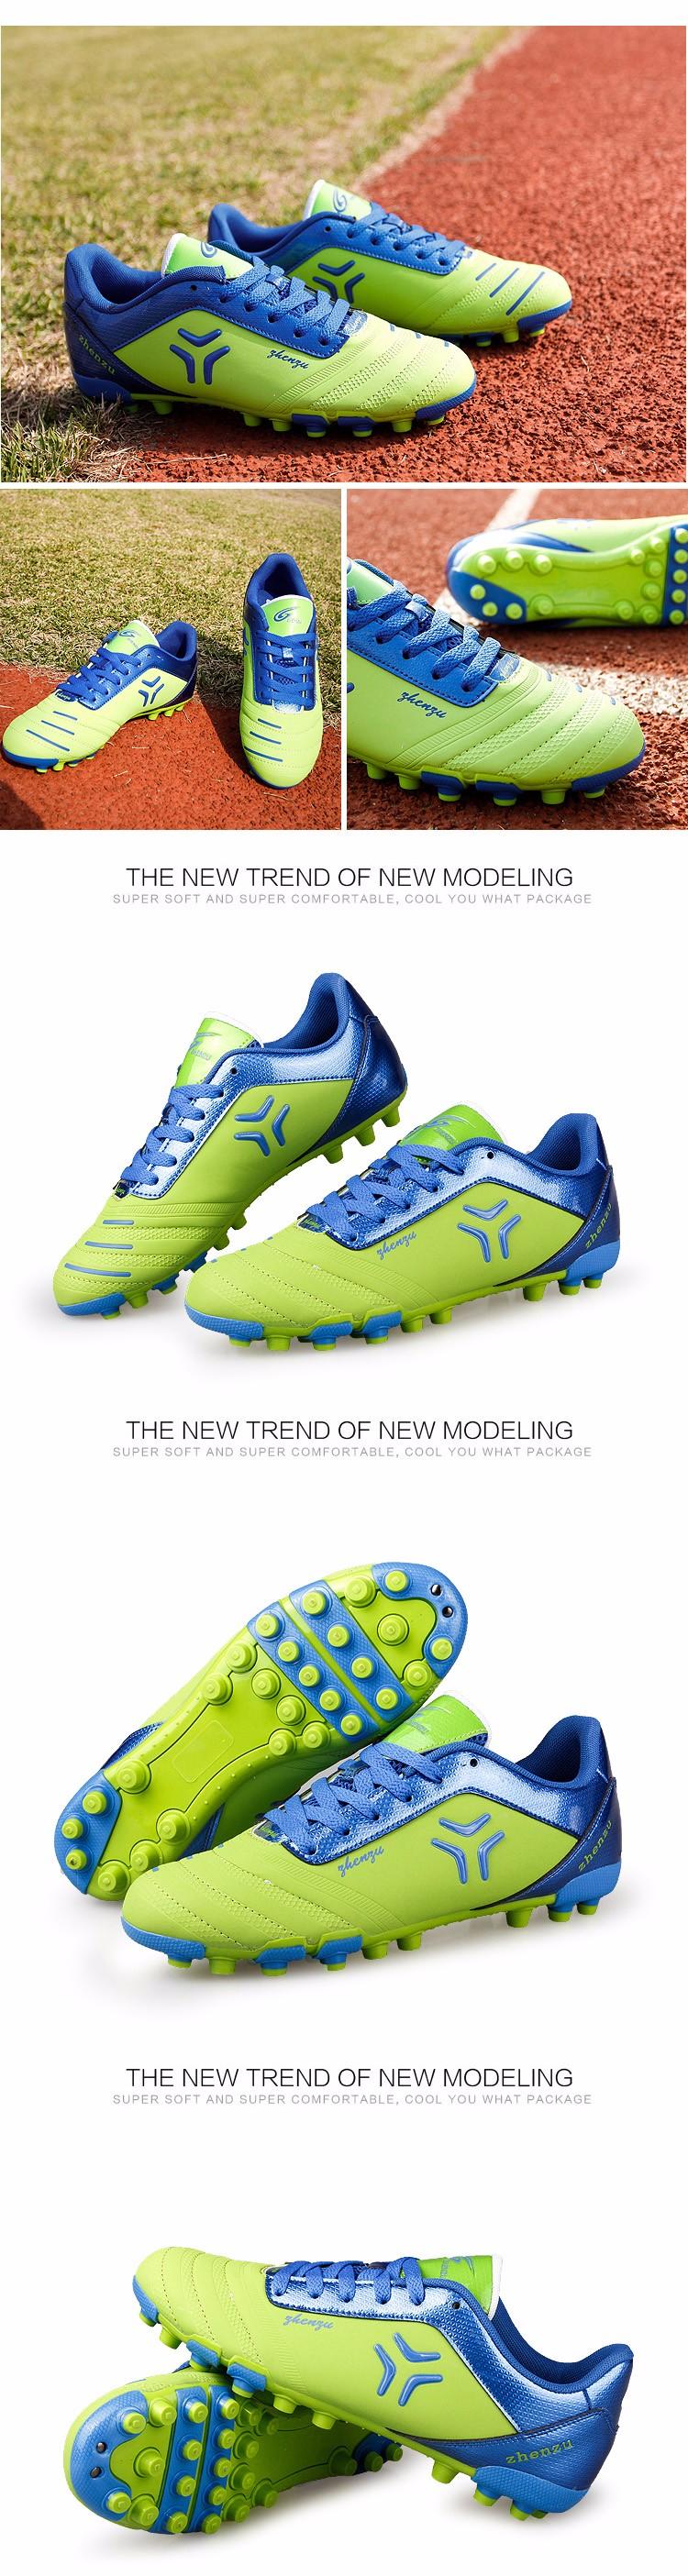 ZHENZU 2017 Football Shoes Soccer Cleats Boots chuteira futebol Training Teenagers Kids AG Artificial Ground chaussure foot  1